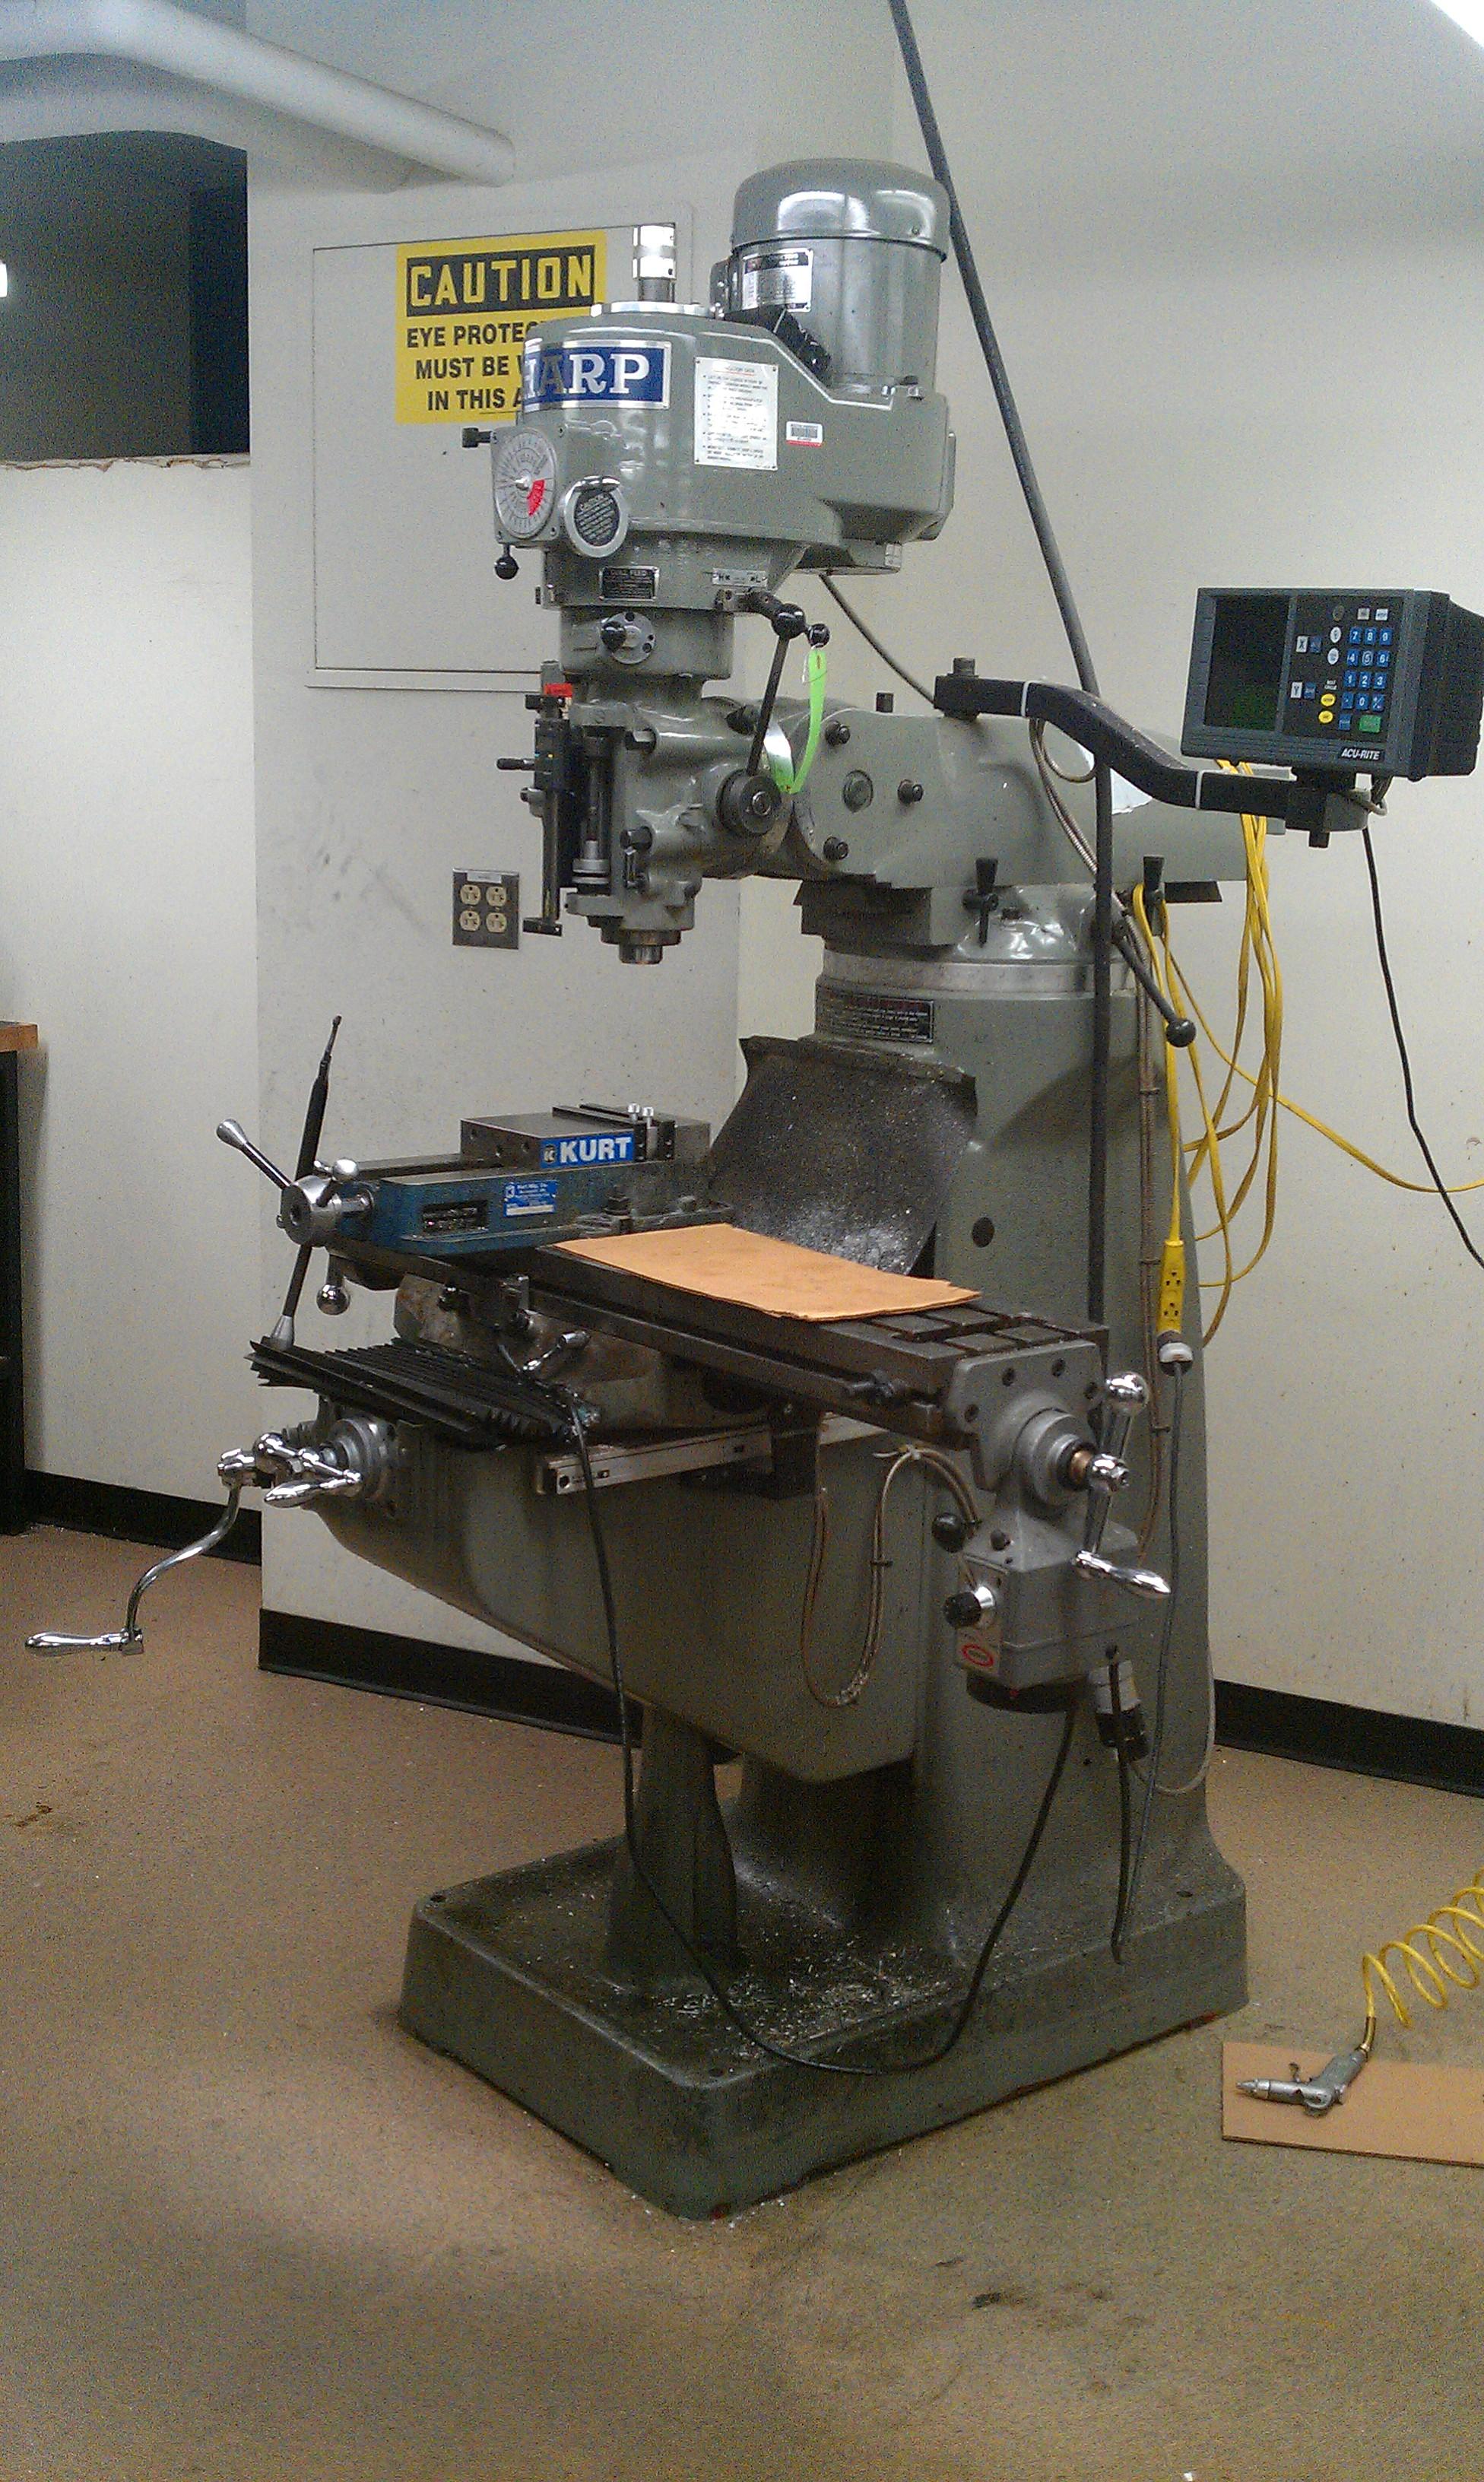 Index 645 manual milling machine mill vertical bridgeport style.